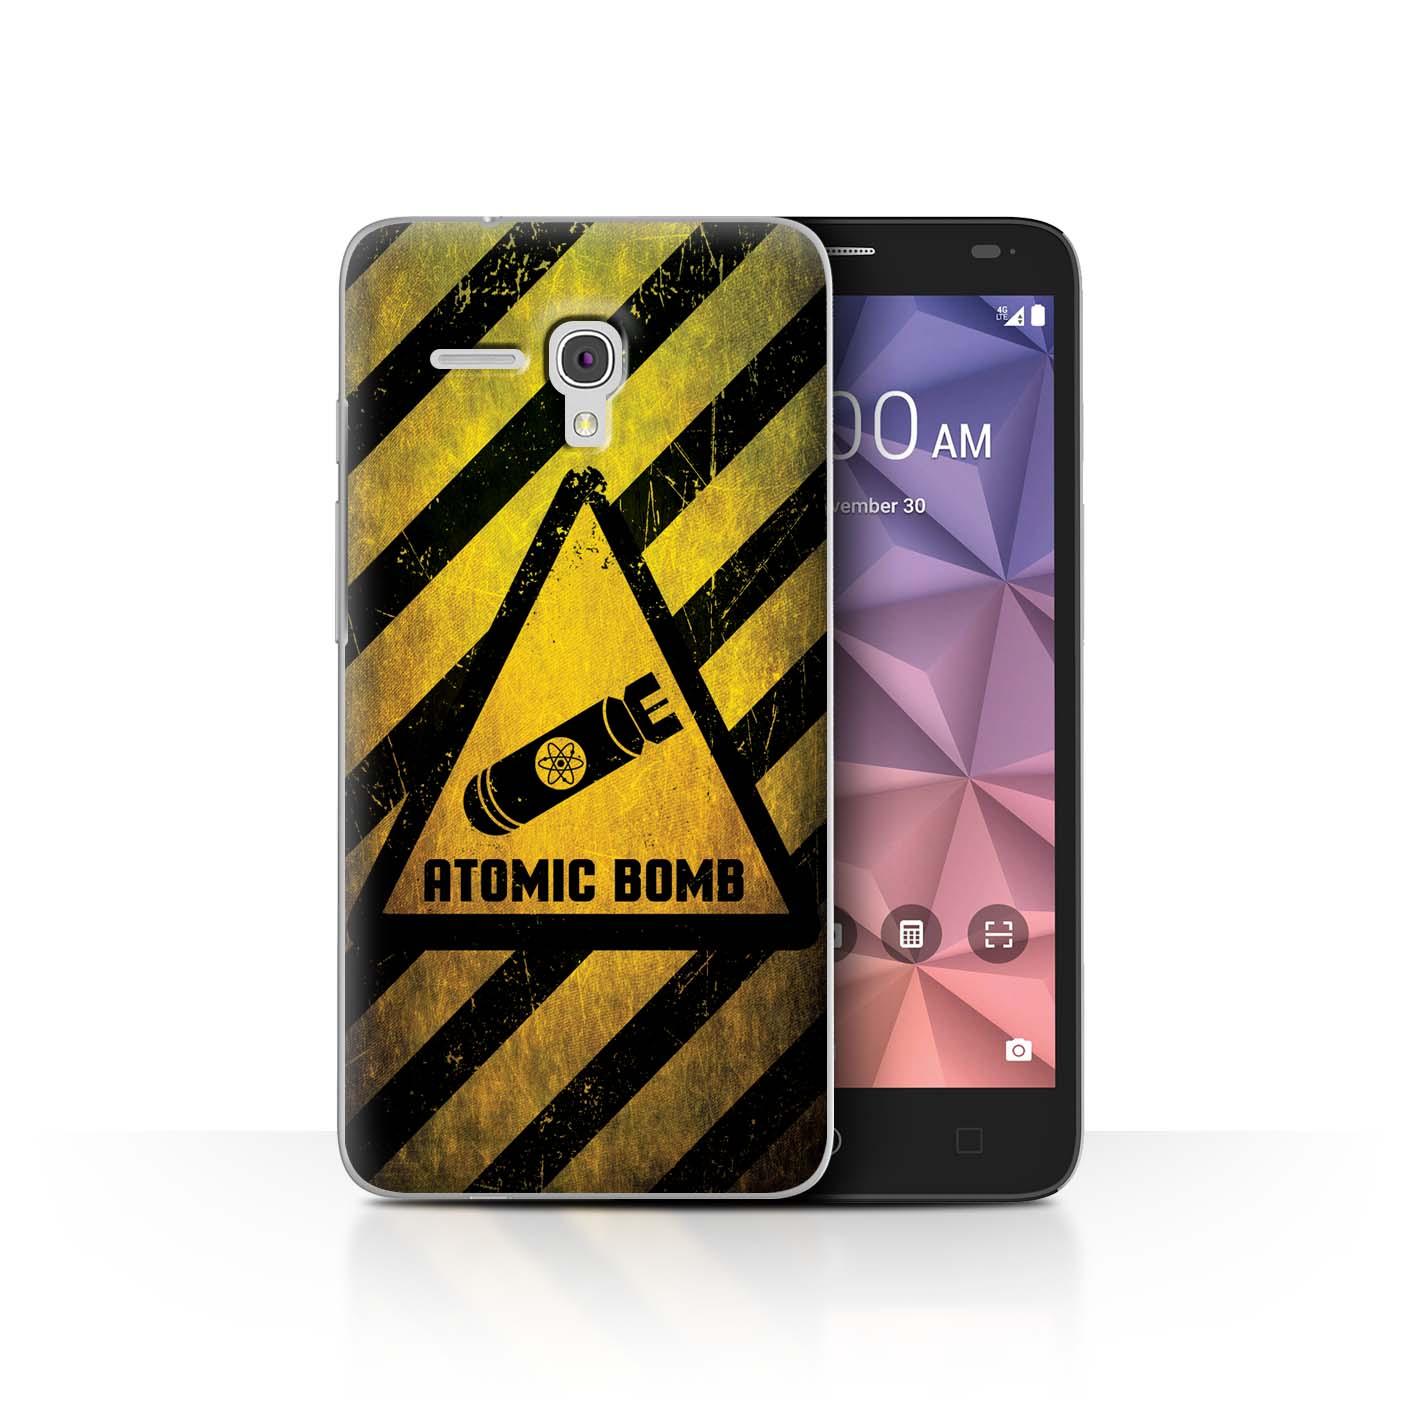 STUFF4-Back-Case-Cover-Skin-for-Alcatel-Fierce-XL-Hazard-Warning-Signs